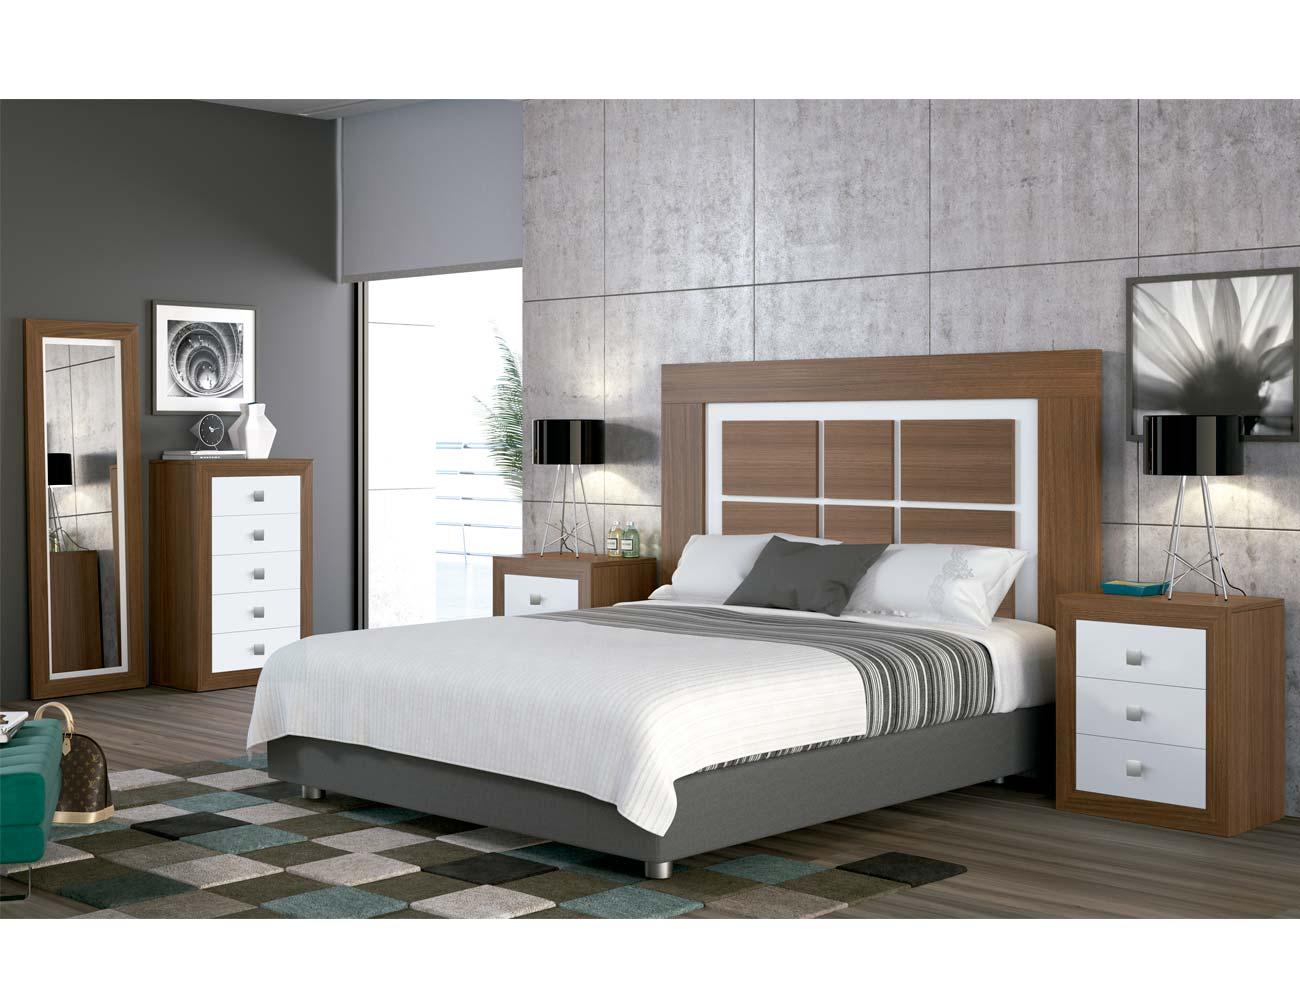 Dormitorio matrimonio moderno 11 nogal blanco